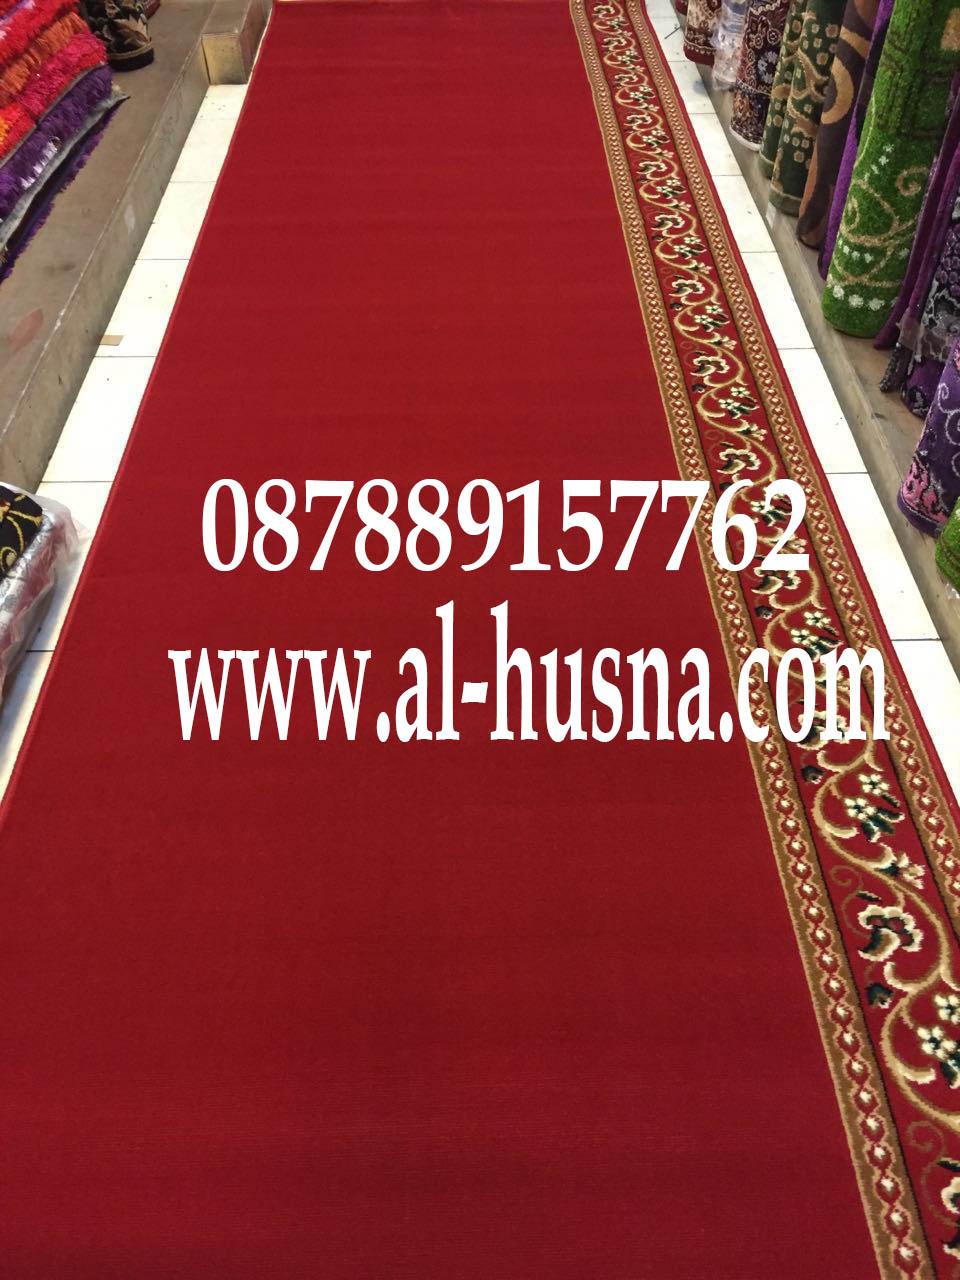 karpet-masjid-Persian-Mosque-al-husna-tanpa-harga.jpg